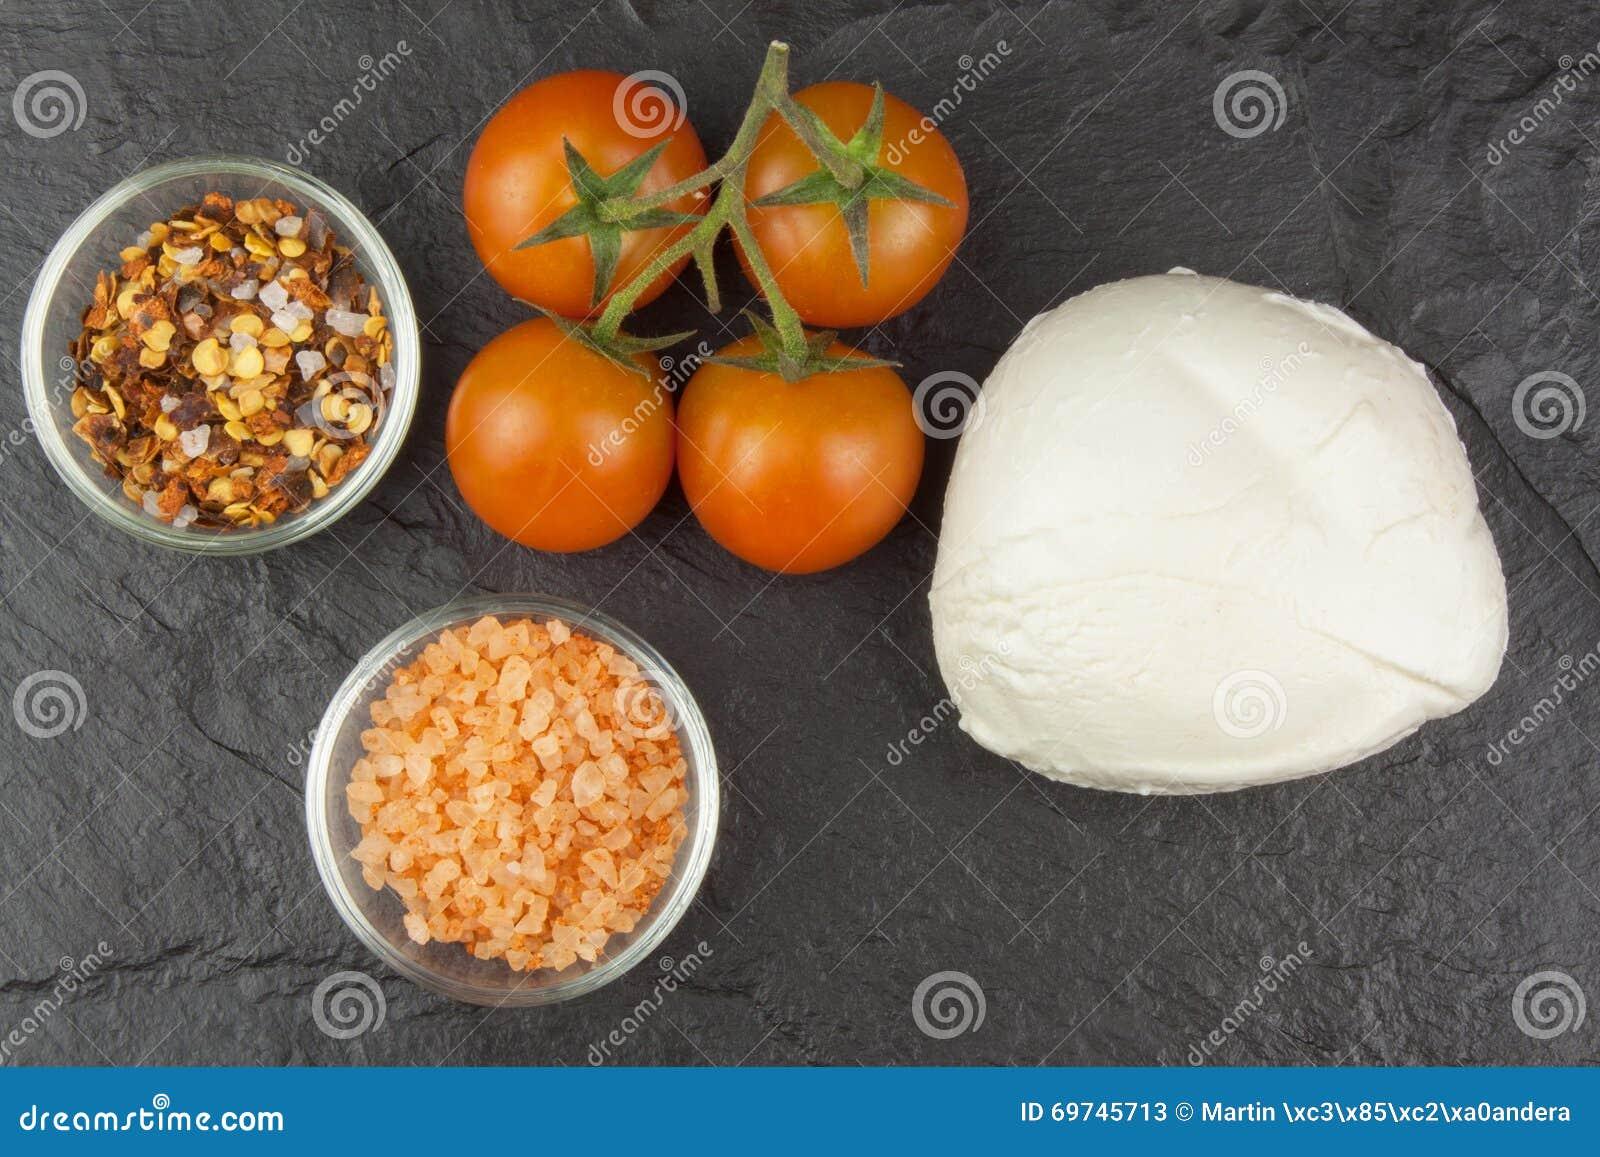 queso blanco para dieta